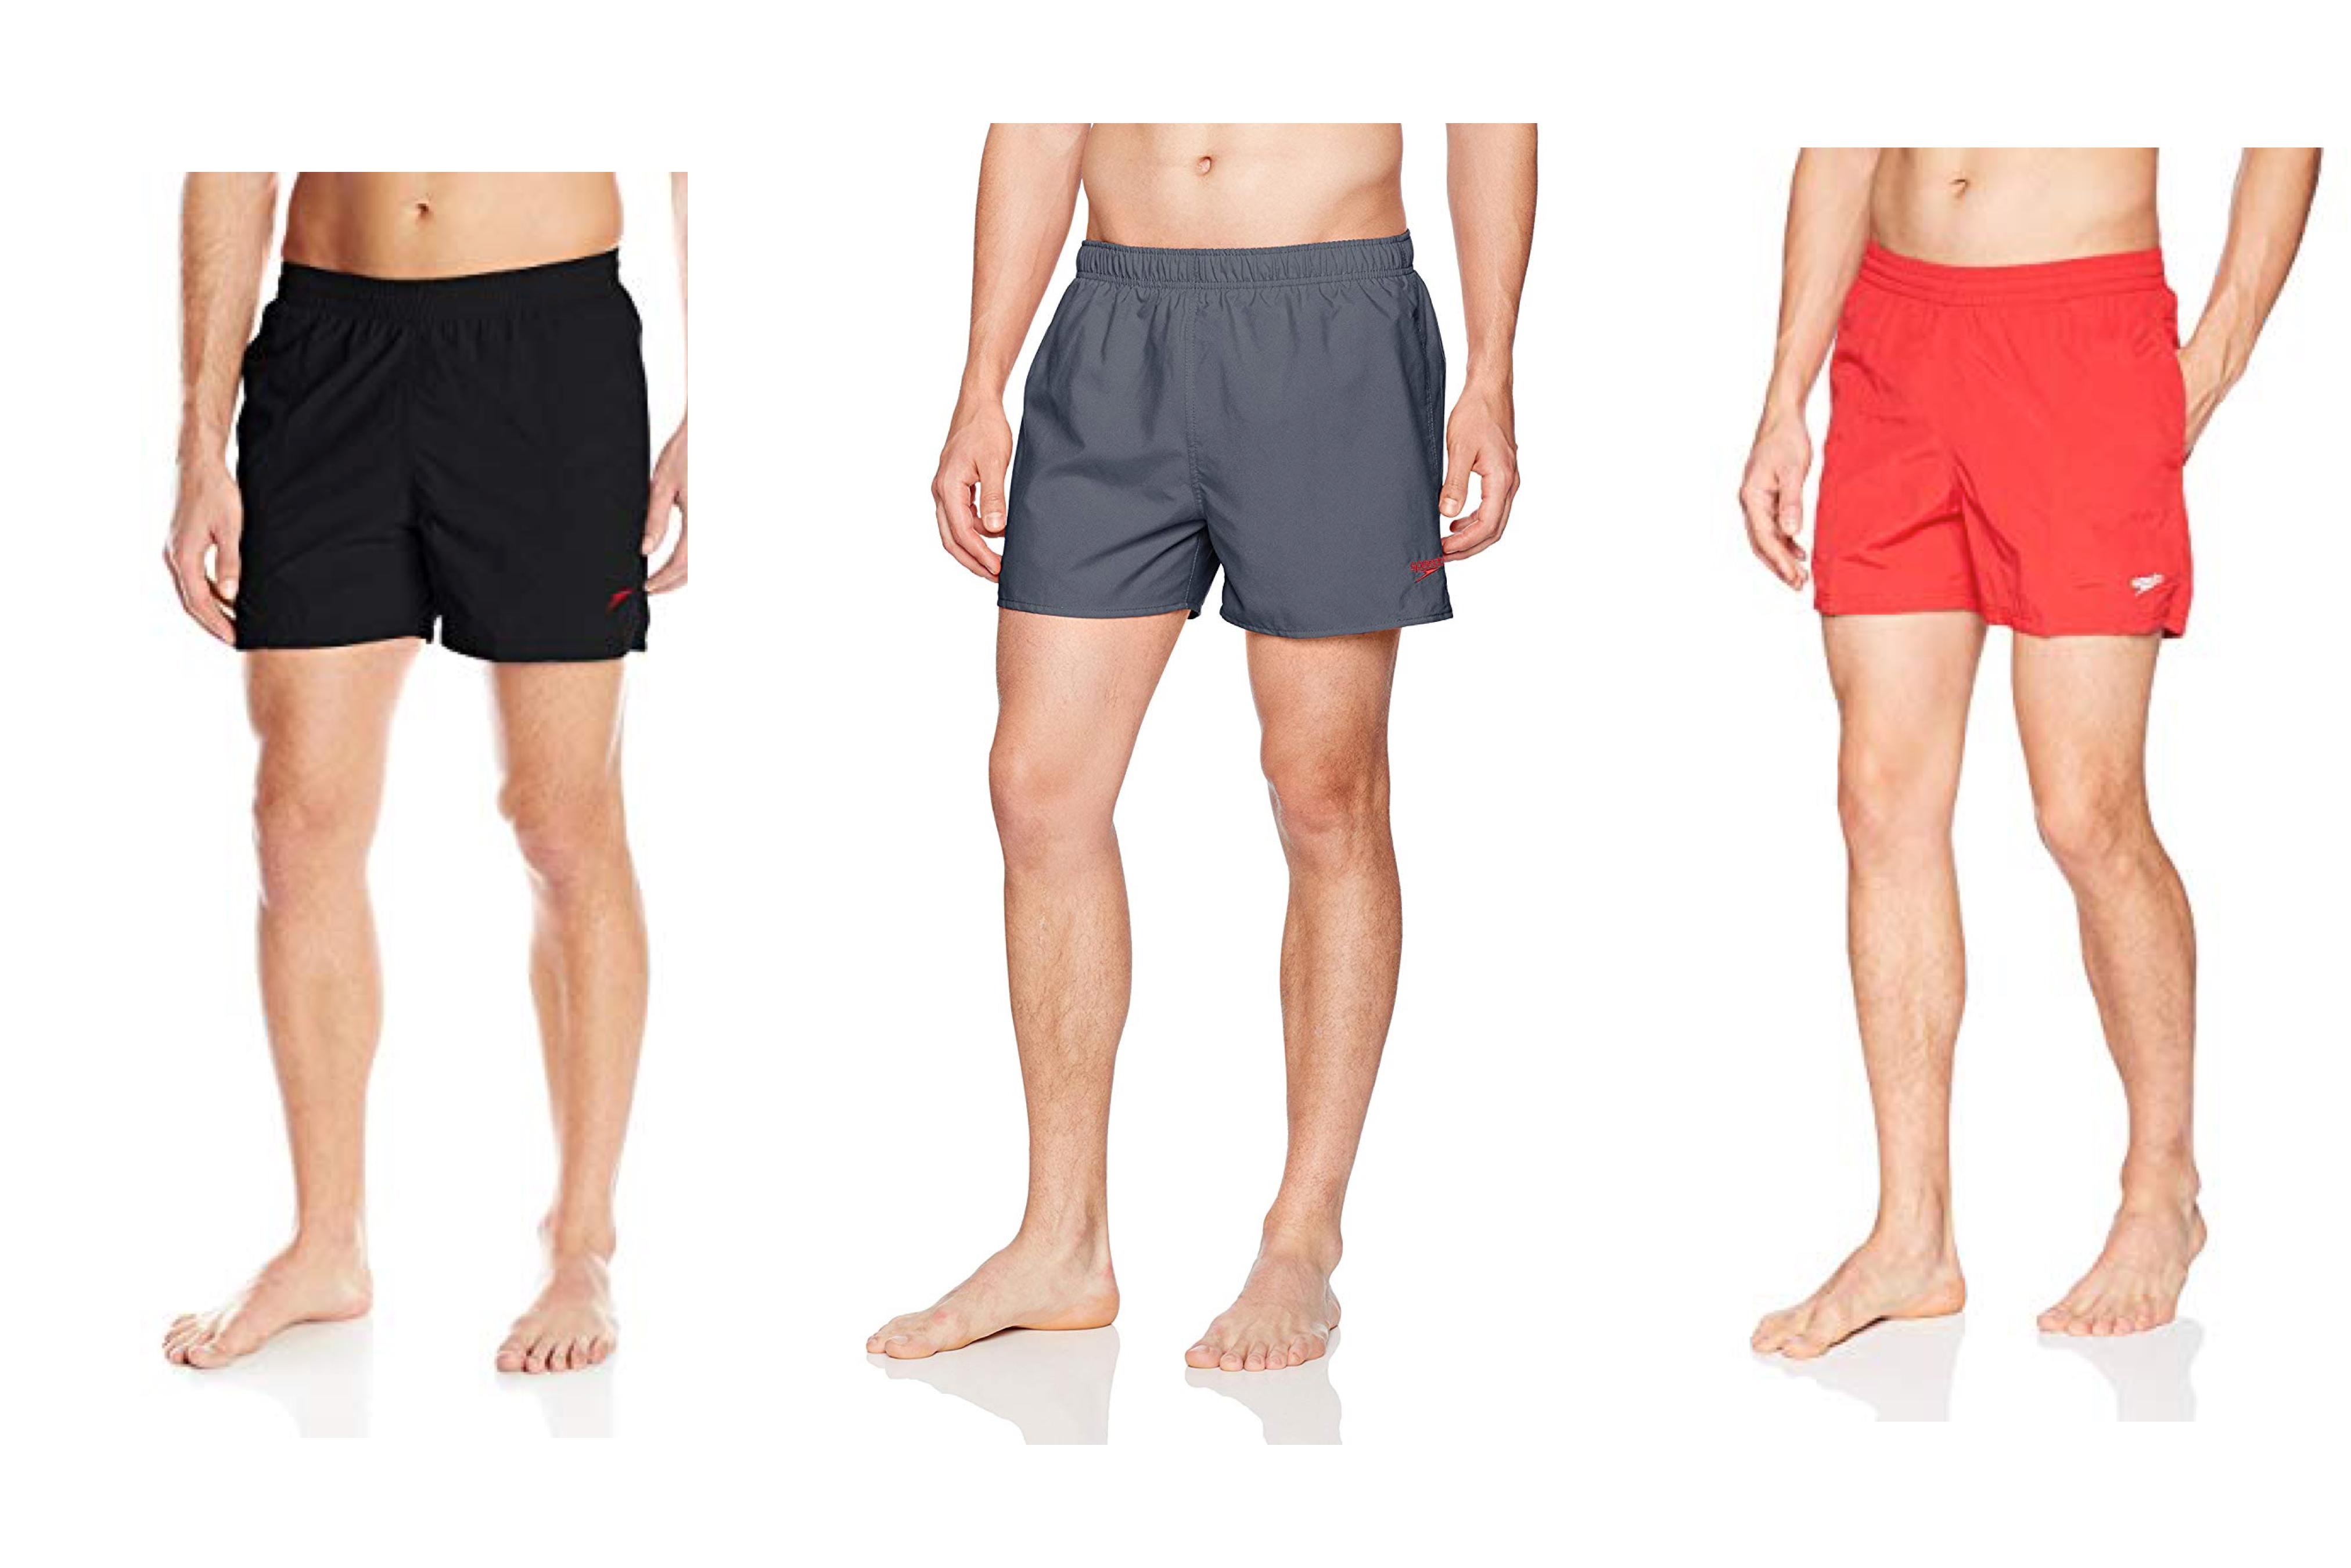 Speedo Men's Surf Runner Bathing Suit